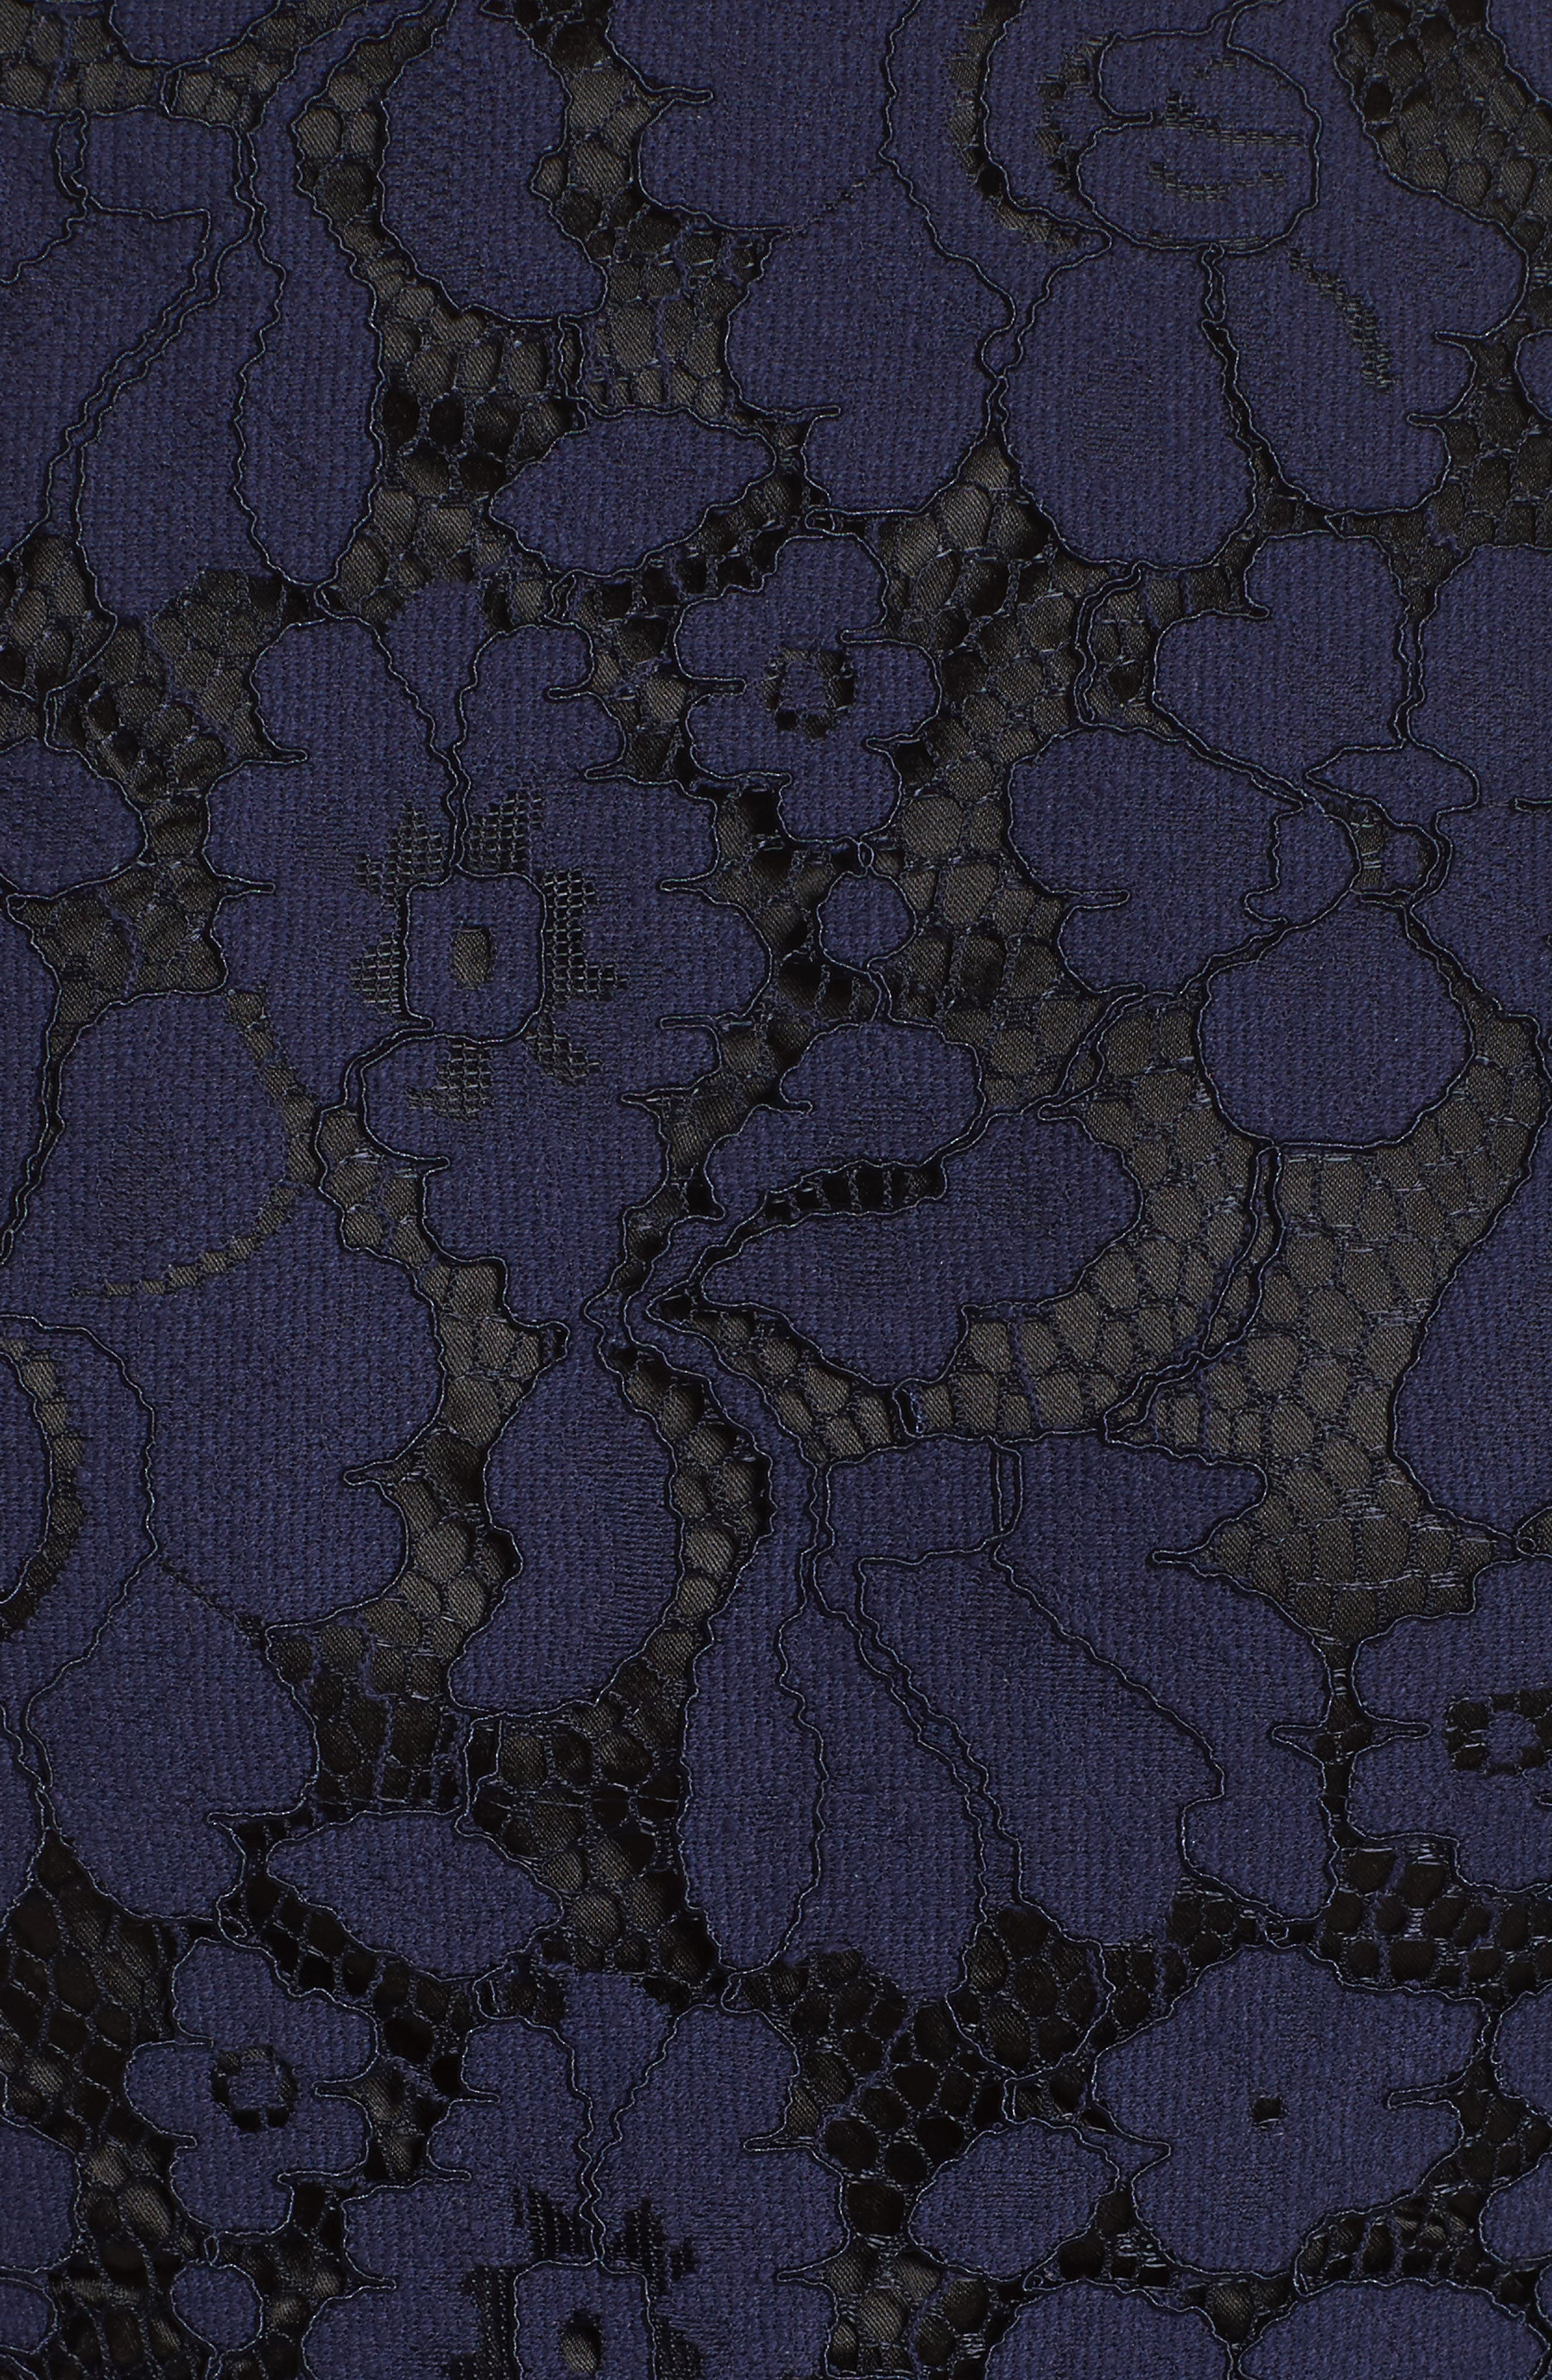 Bell Sleeve Lace Dress,                             Alternate thumbnail 5, color,                             Navy/ Black